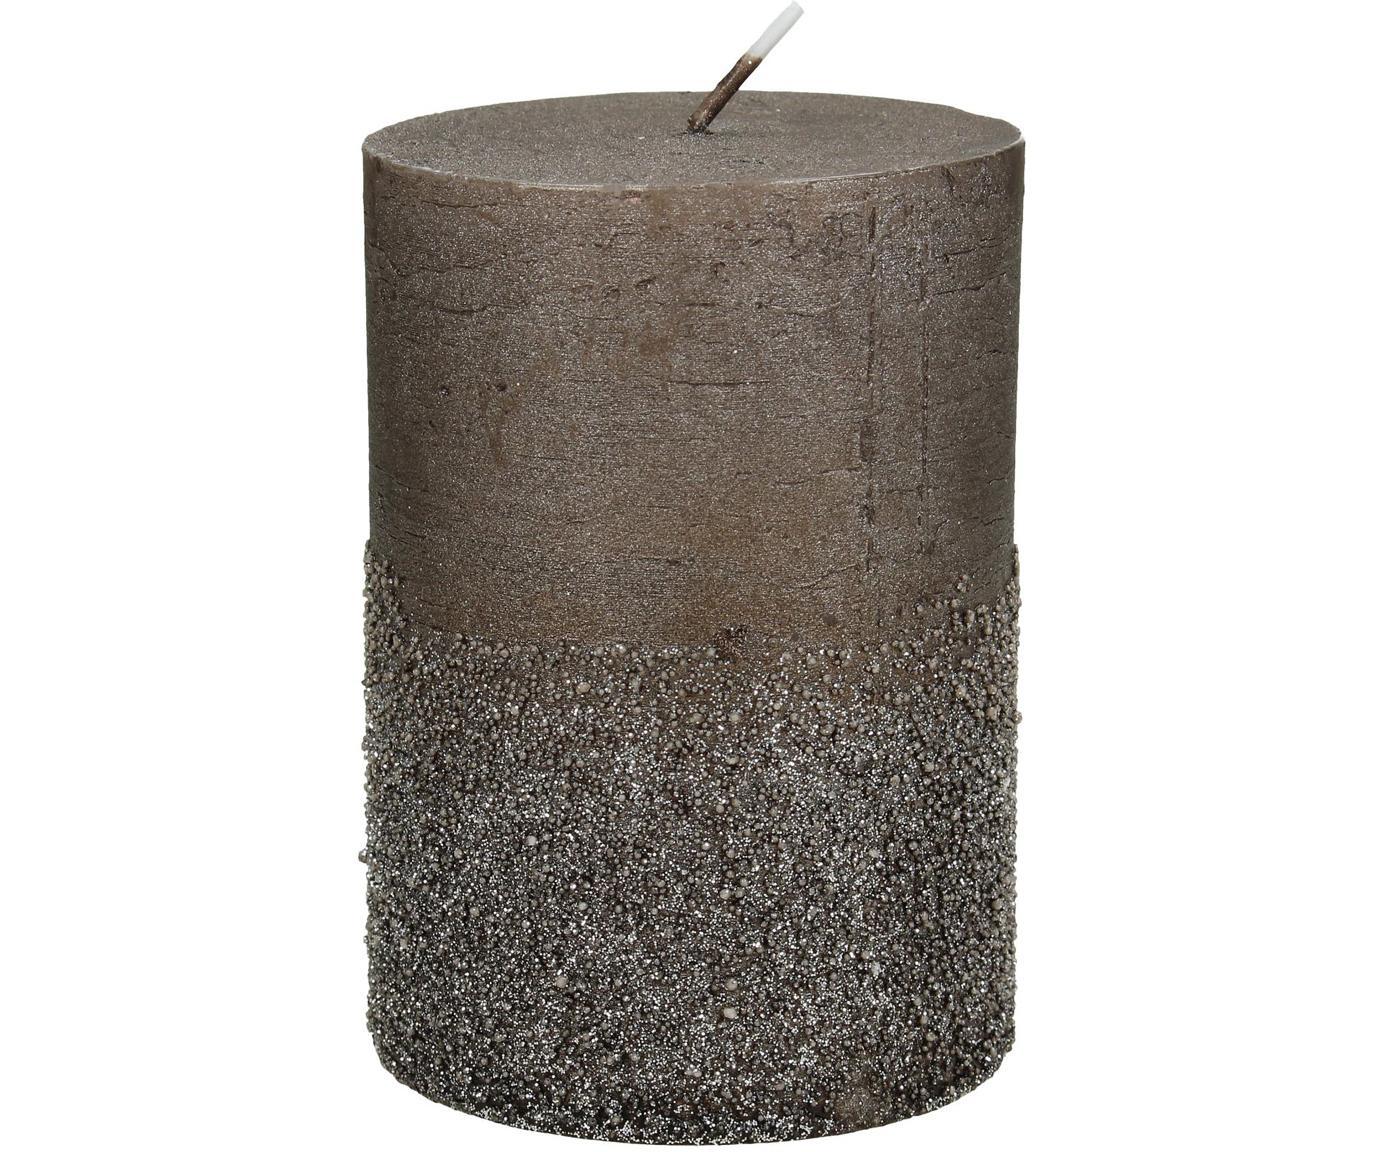 Stompkaars Glitters, Was, Bruin, Ø 7 cm